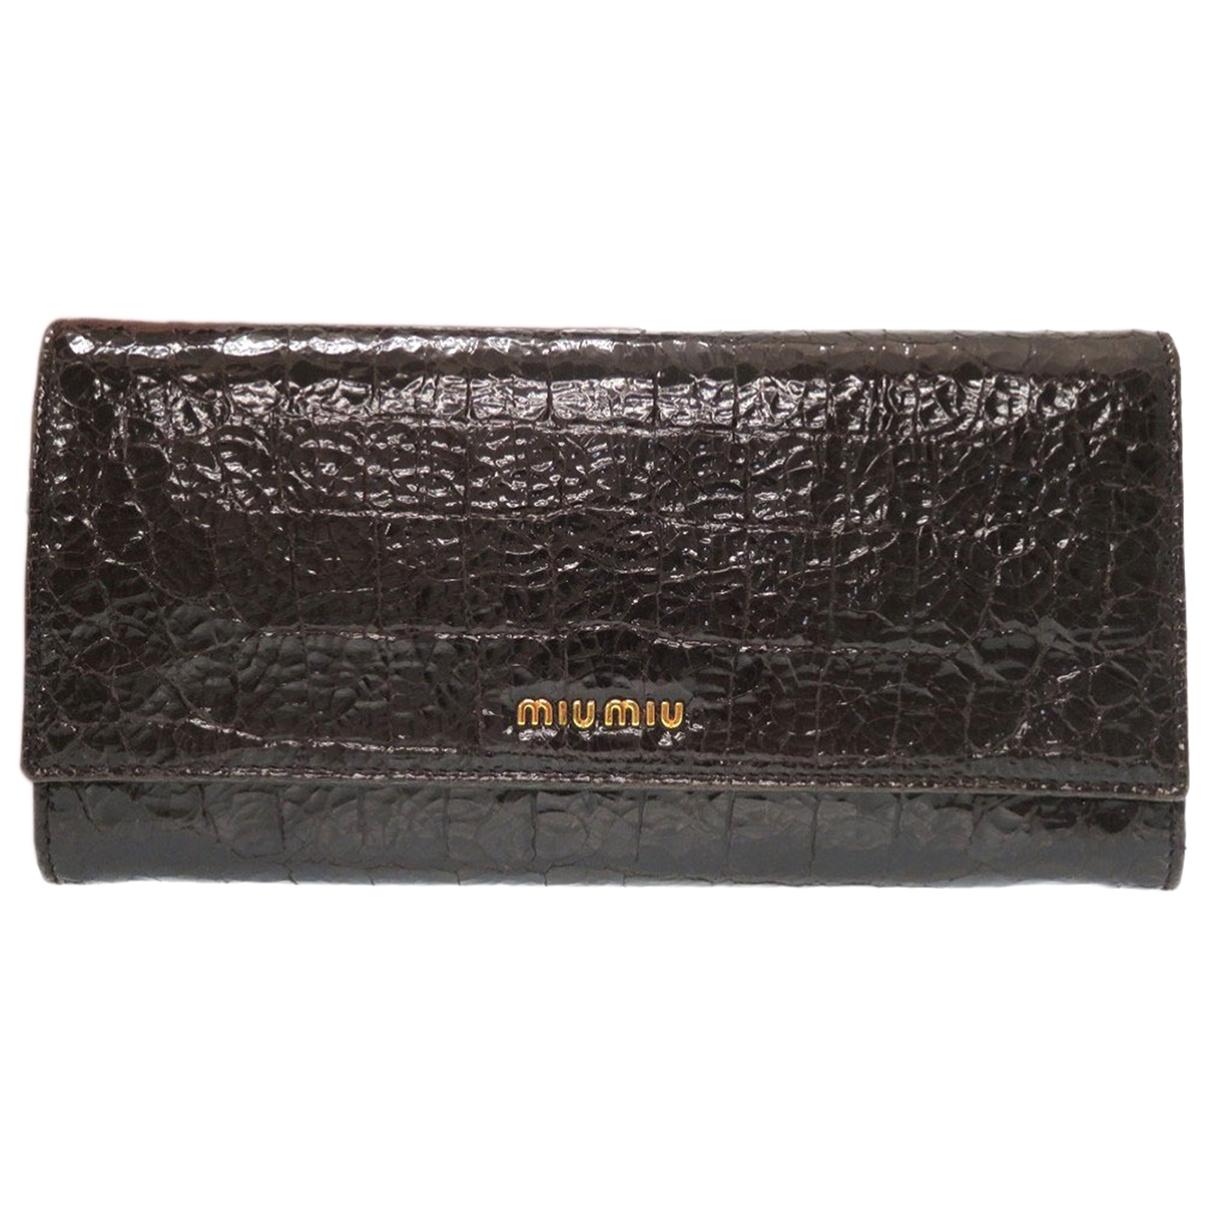 Miu Miu \N Brown Patent leather wallet for Women \N